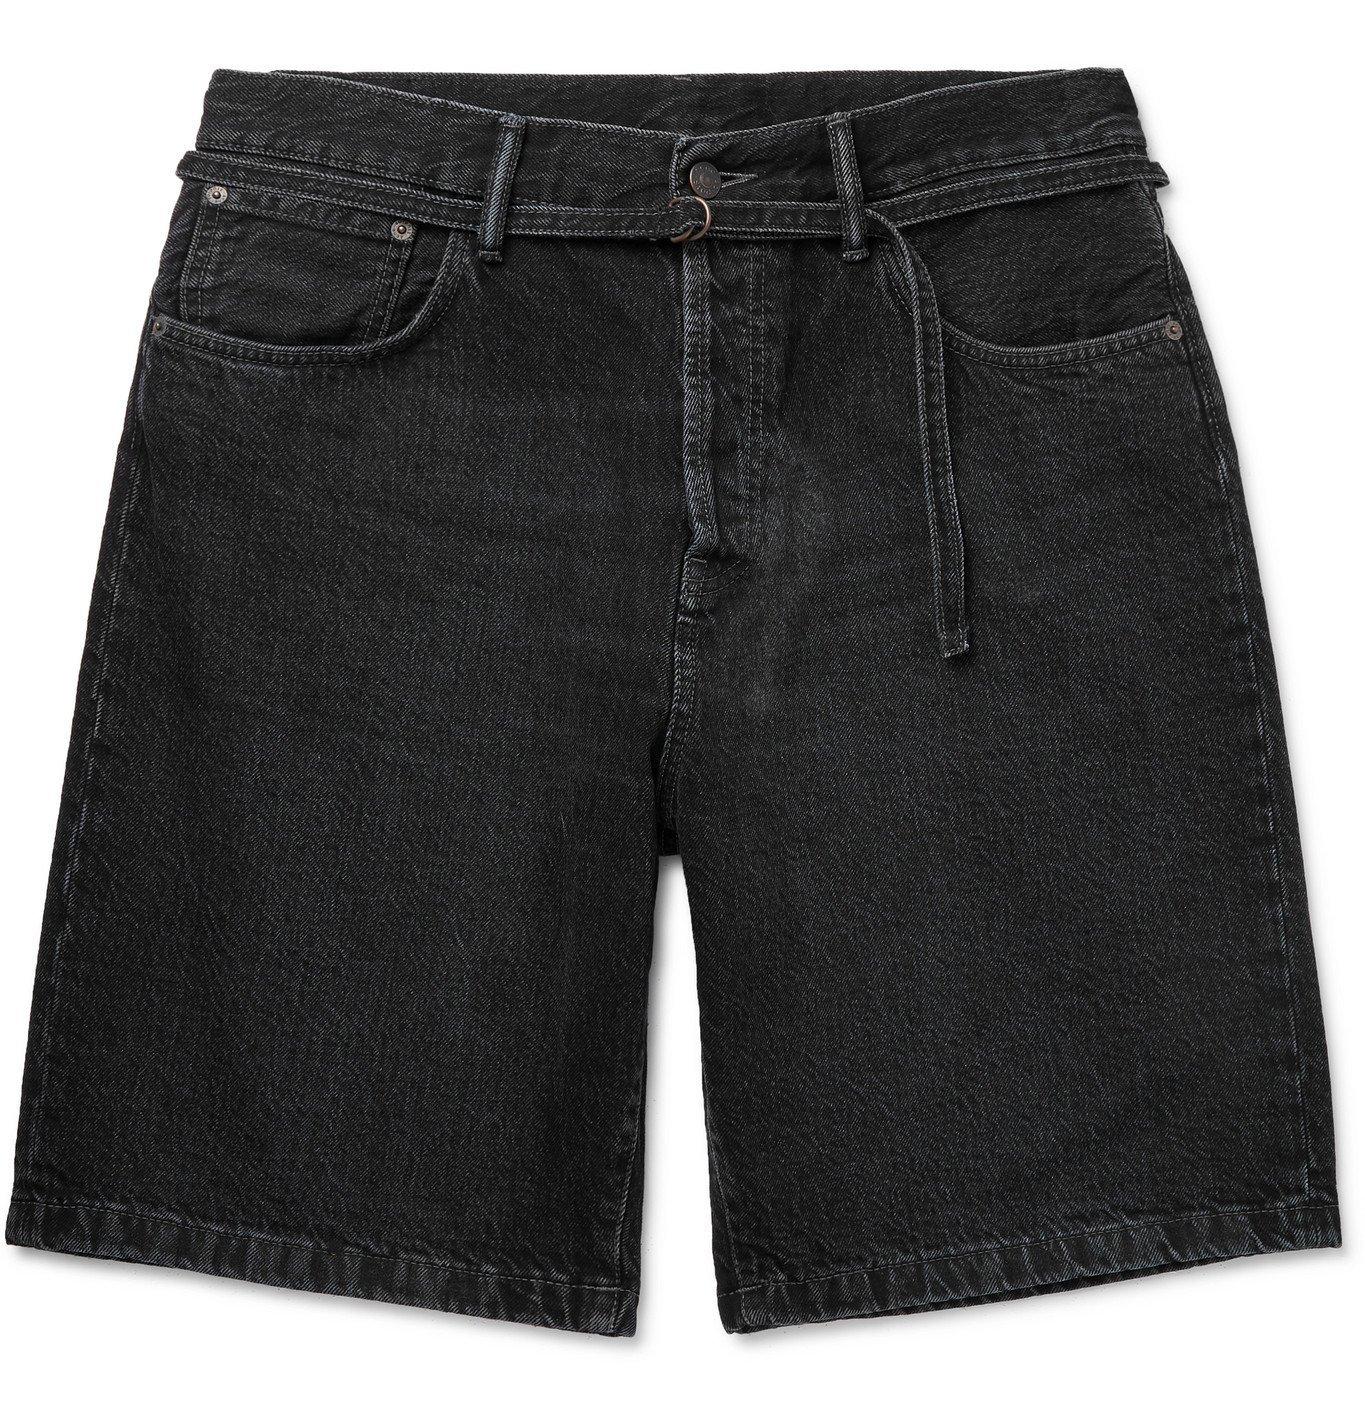 ACNE STUDIOS - Rowland Wide-Leg Belted Denim Shorts - Black